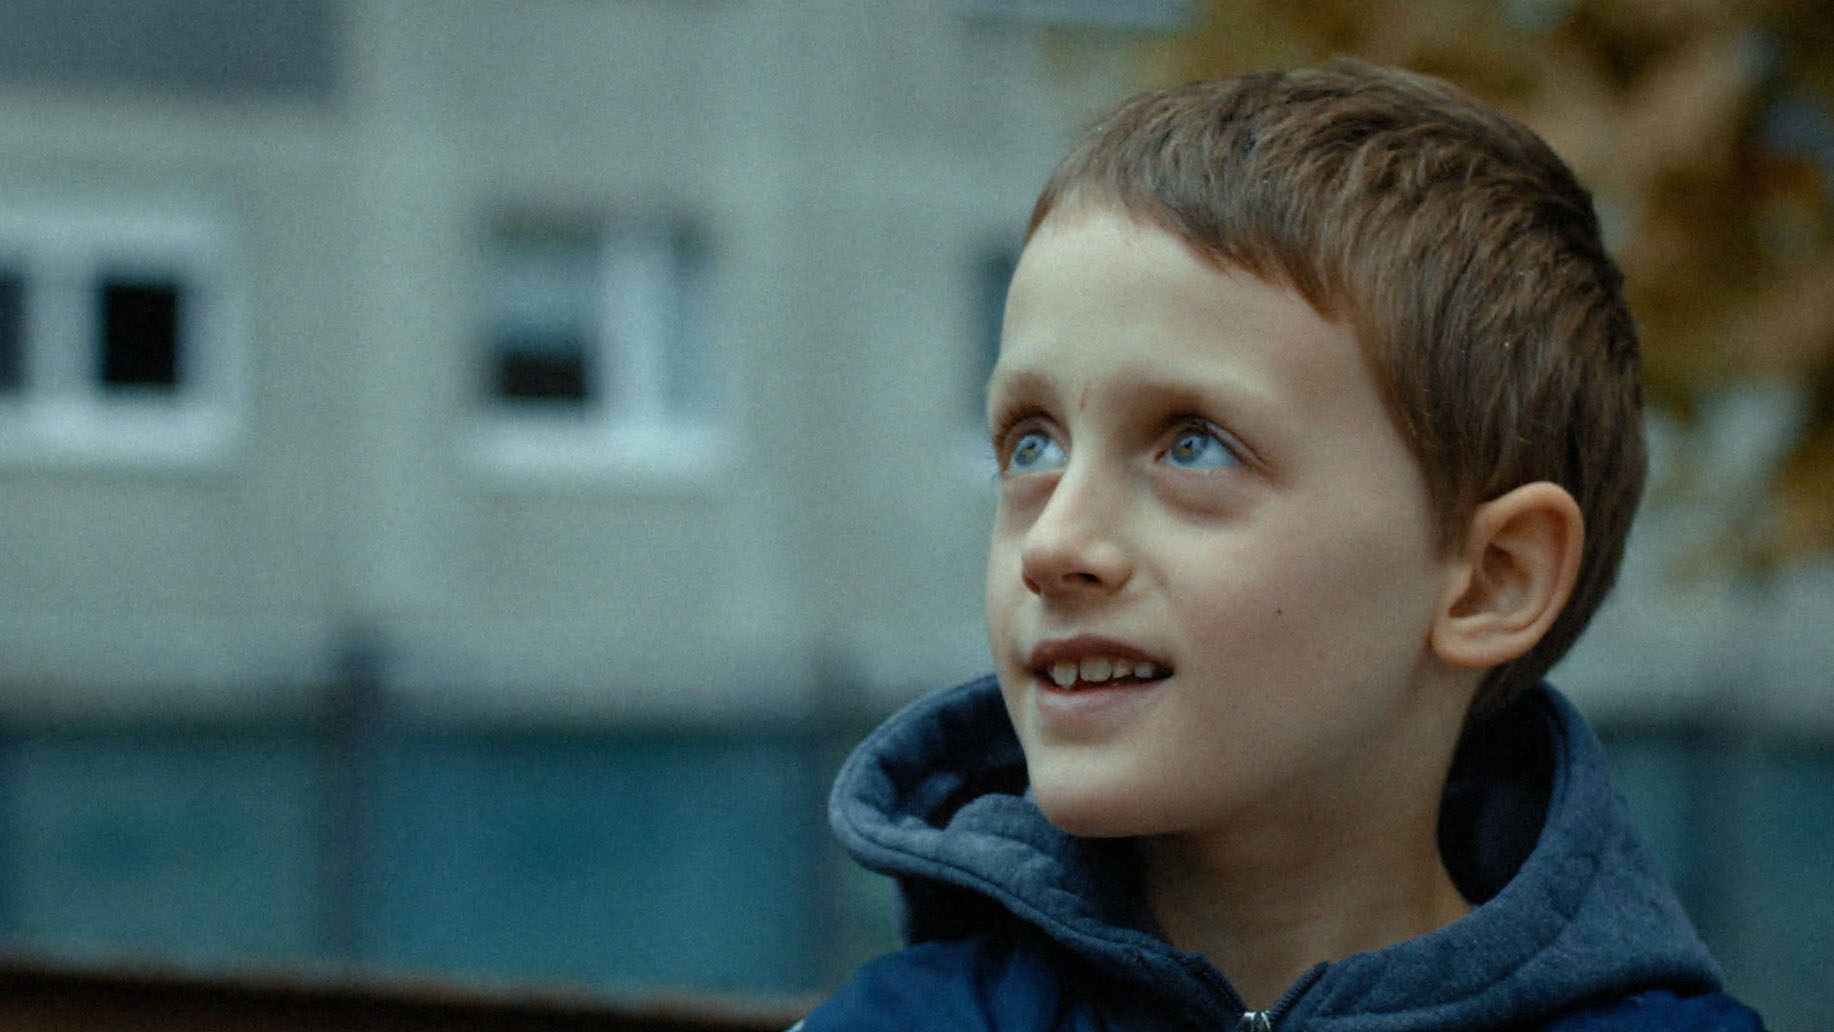 Short filmby Martin Turk